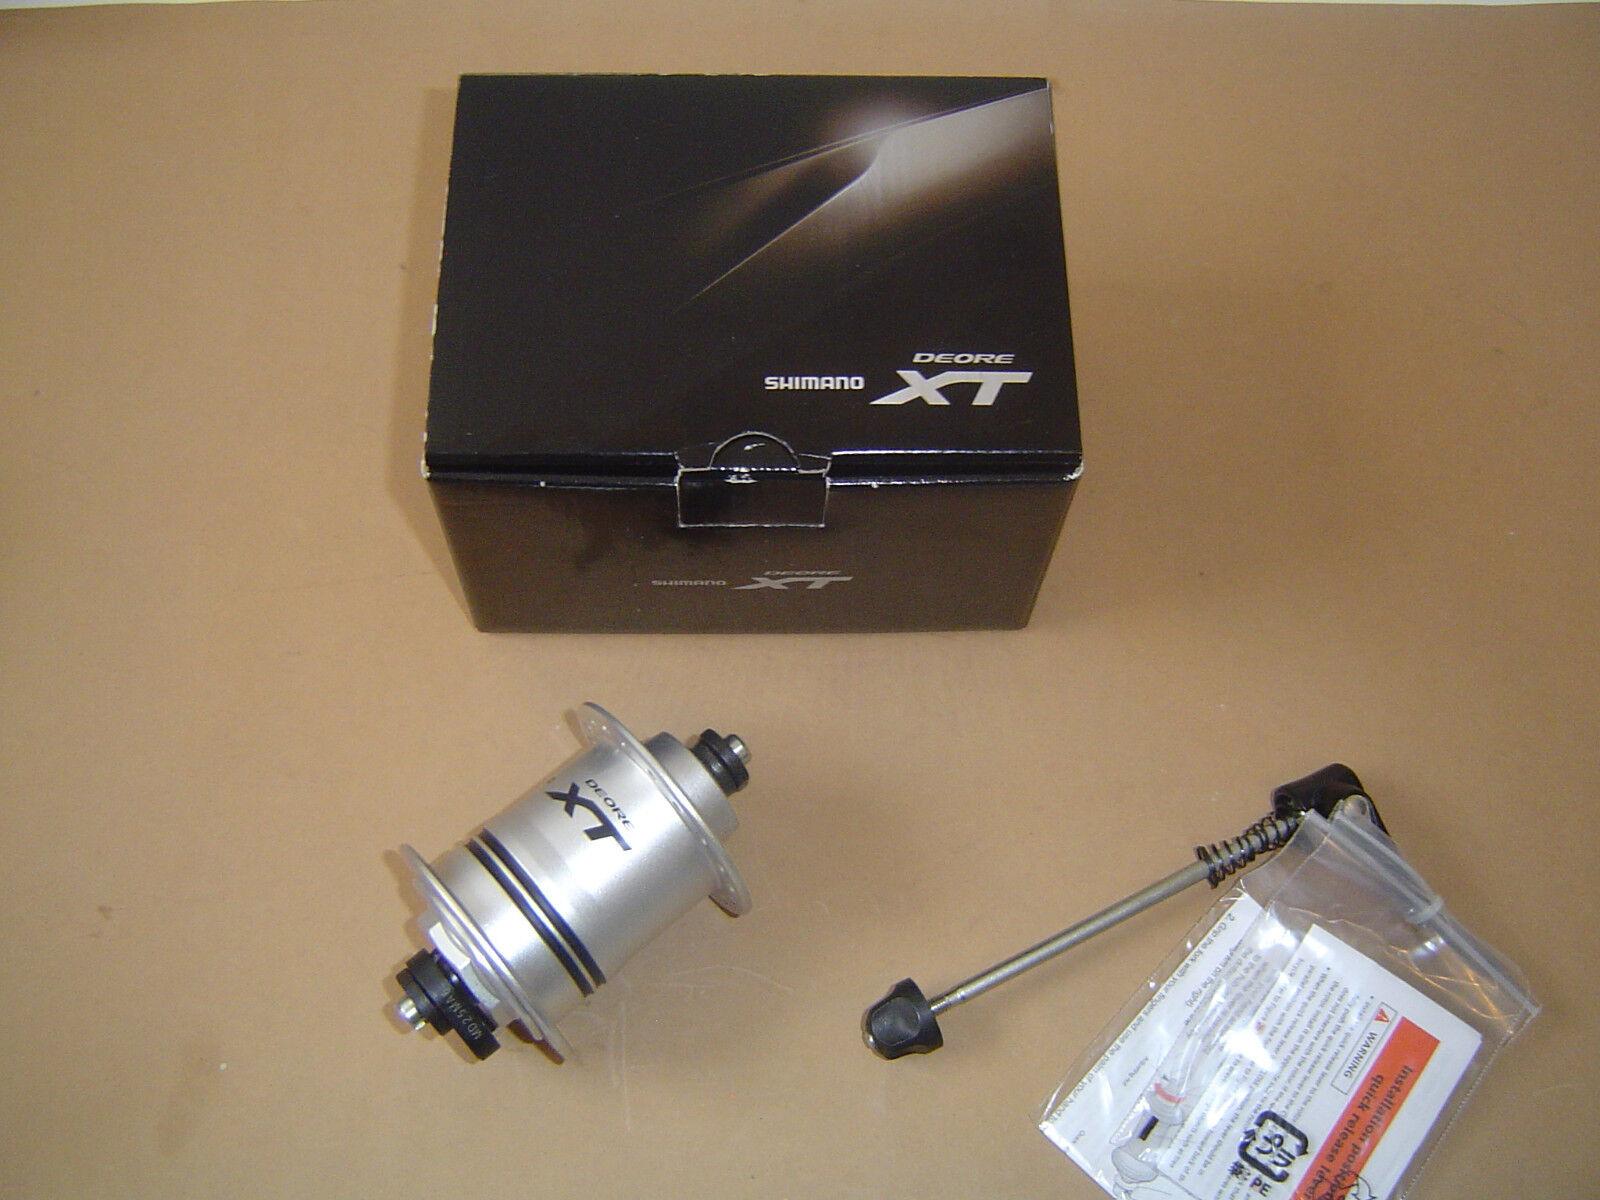 Shimano Deore XT DH-T780-1N Nabendynamo LED 1,5 Watt 32 36 Loch Silber OVP Neu